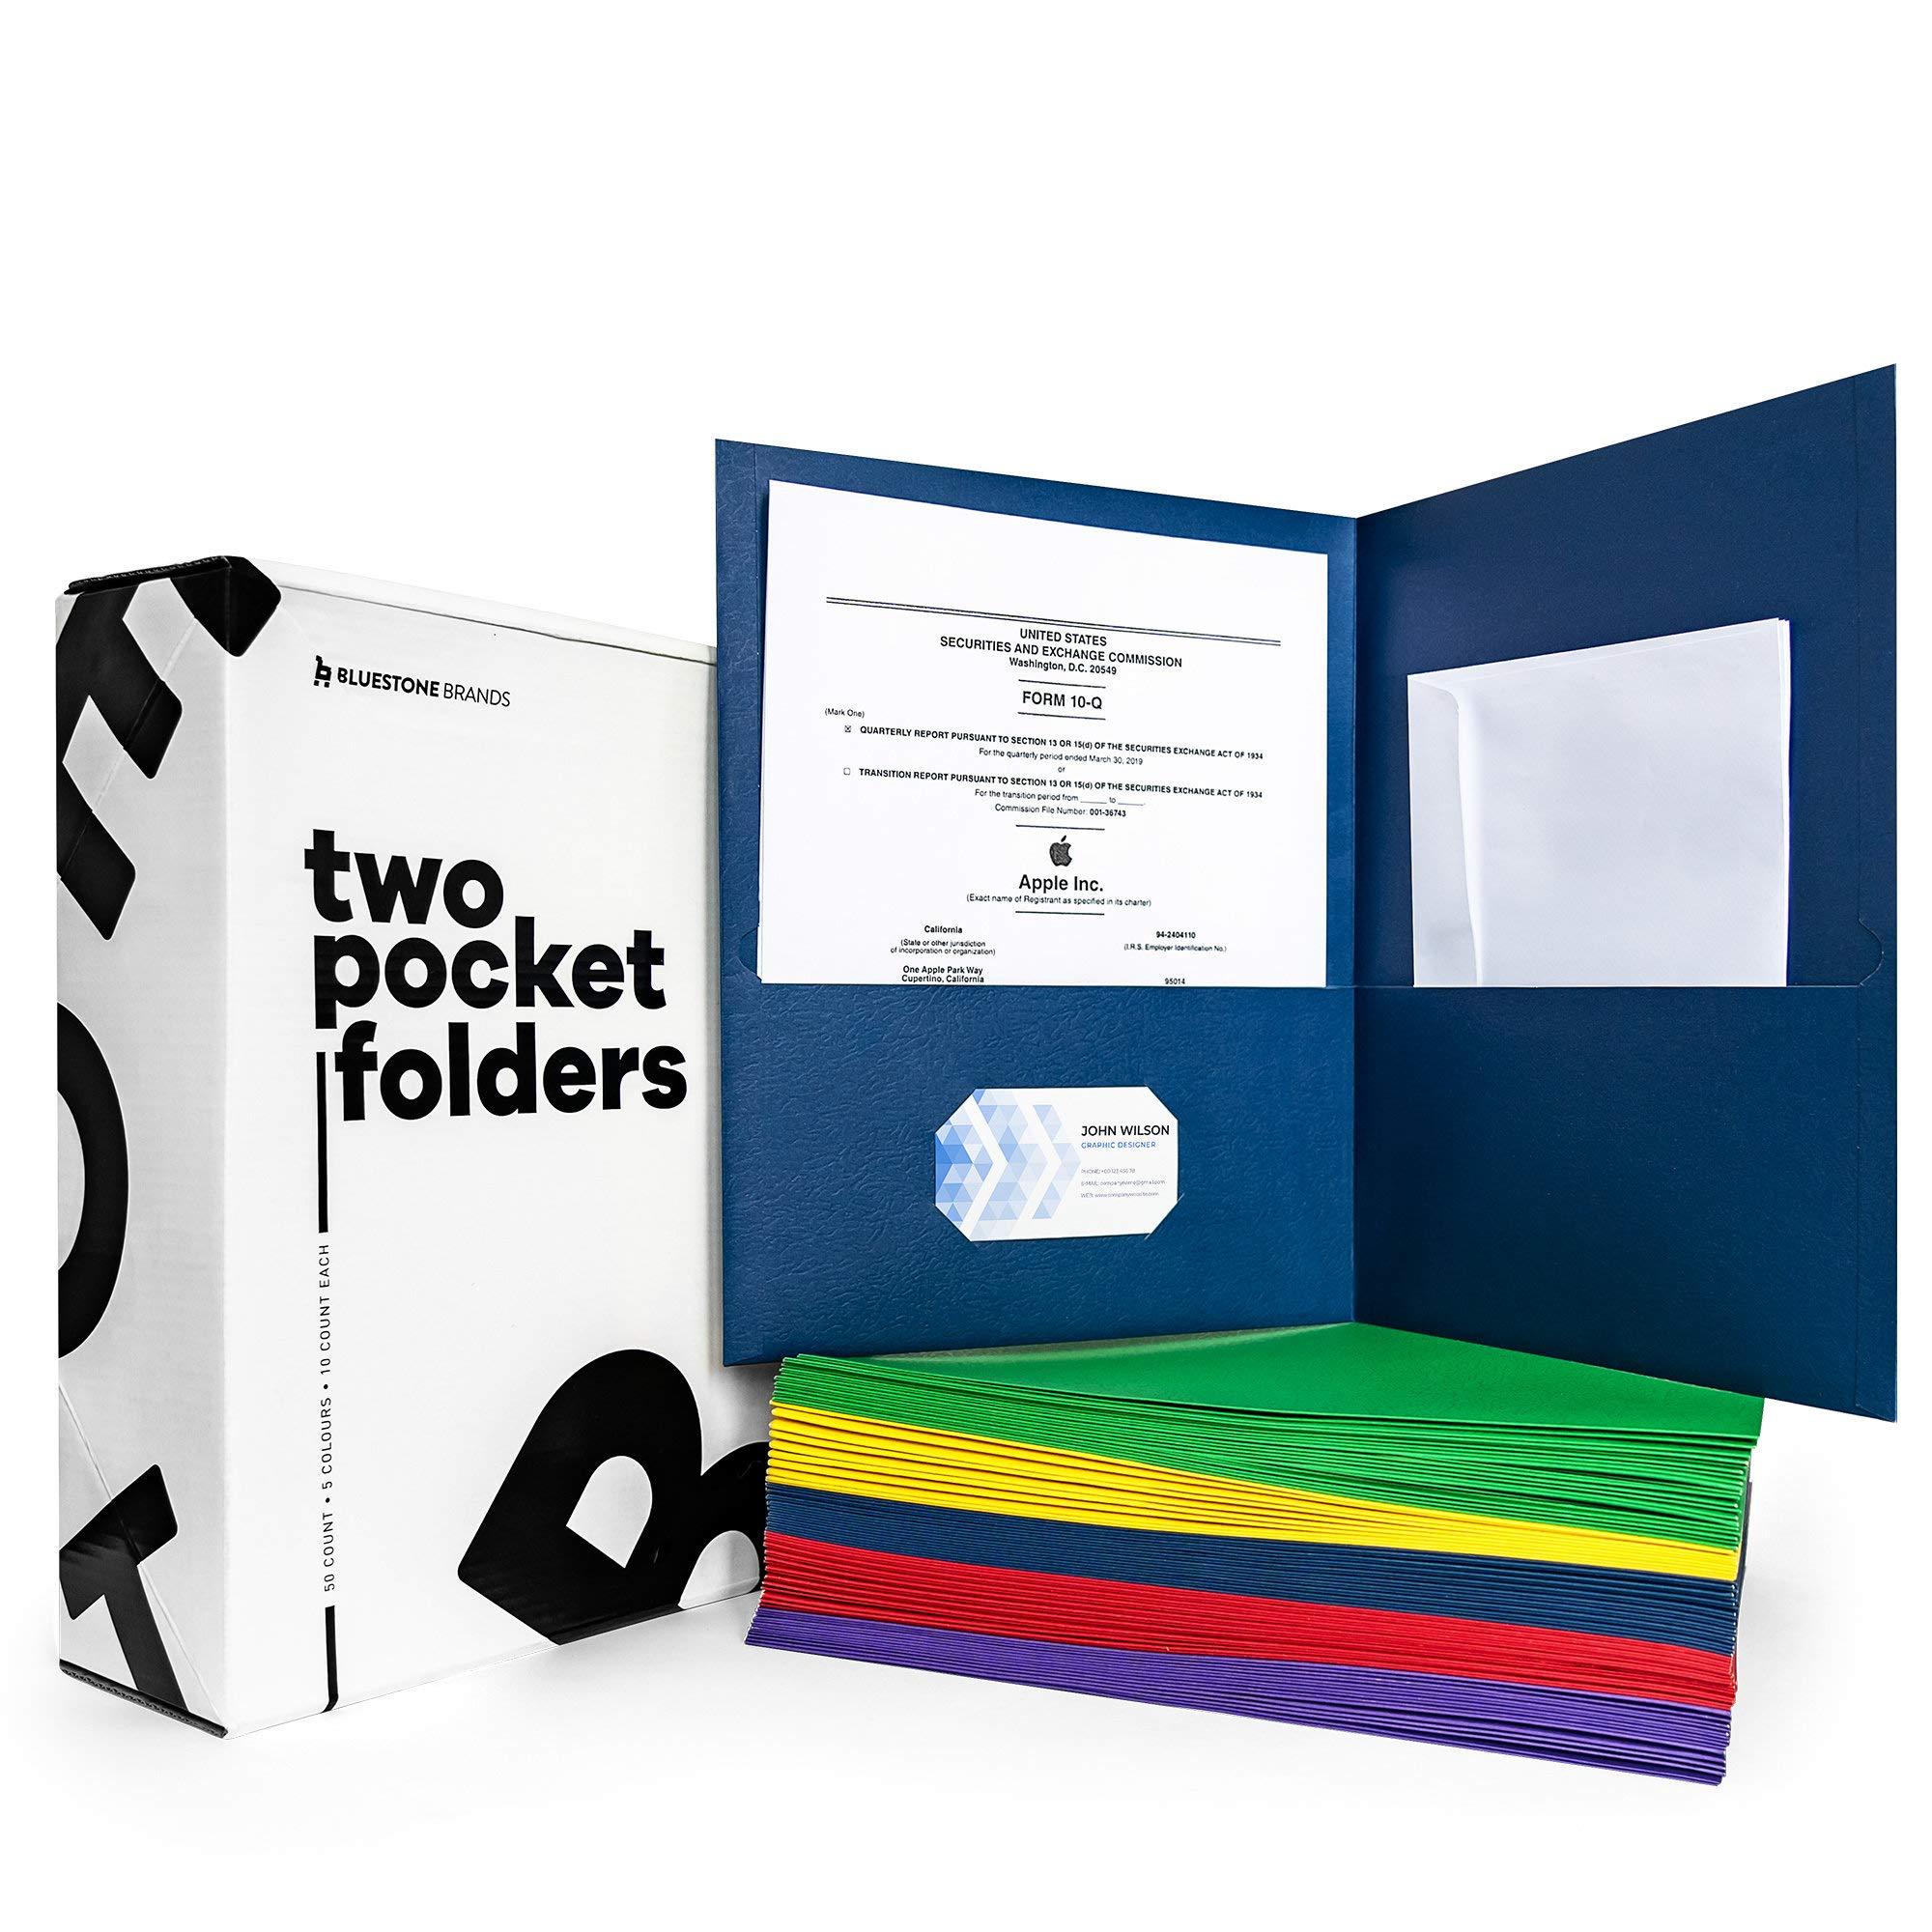 Folders with Pockets (50 Pack) - Two Pocket Folders Bulk - 2 Pocket Folders - Pocket Folders No Prongs - School Folders with Pockets - Pocket File Folders - Oxford - Paper Letter // Bluestone Brands